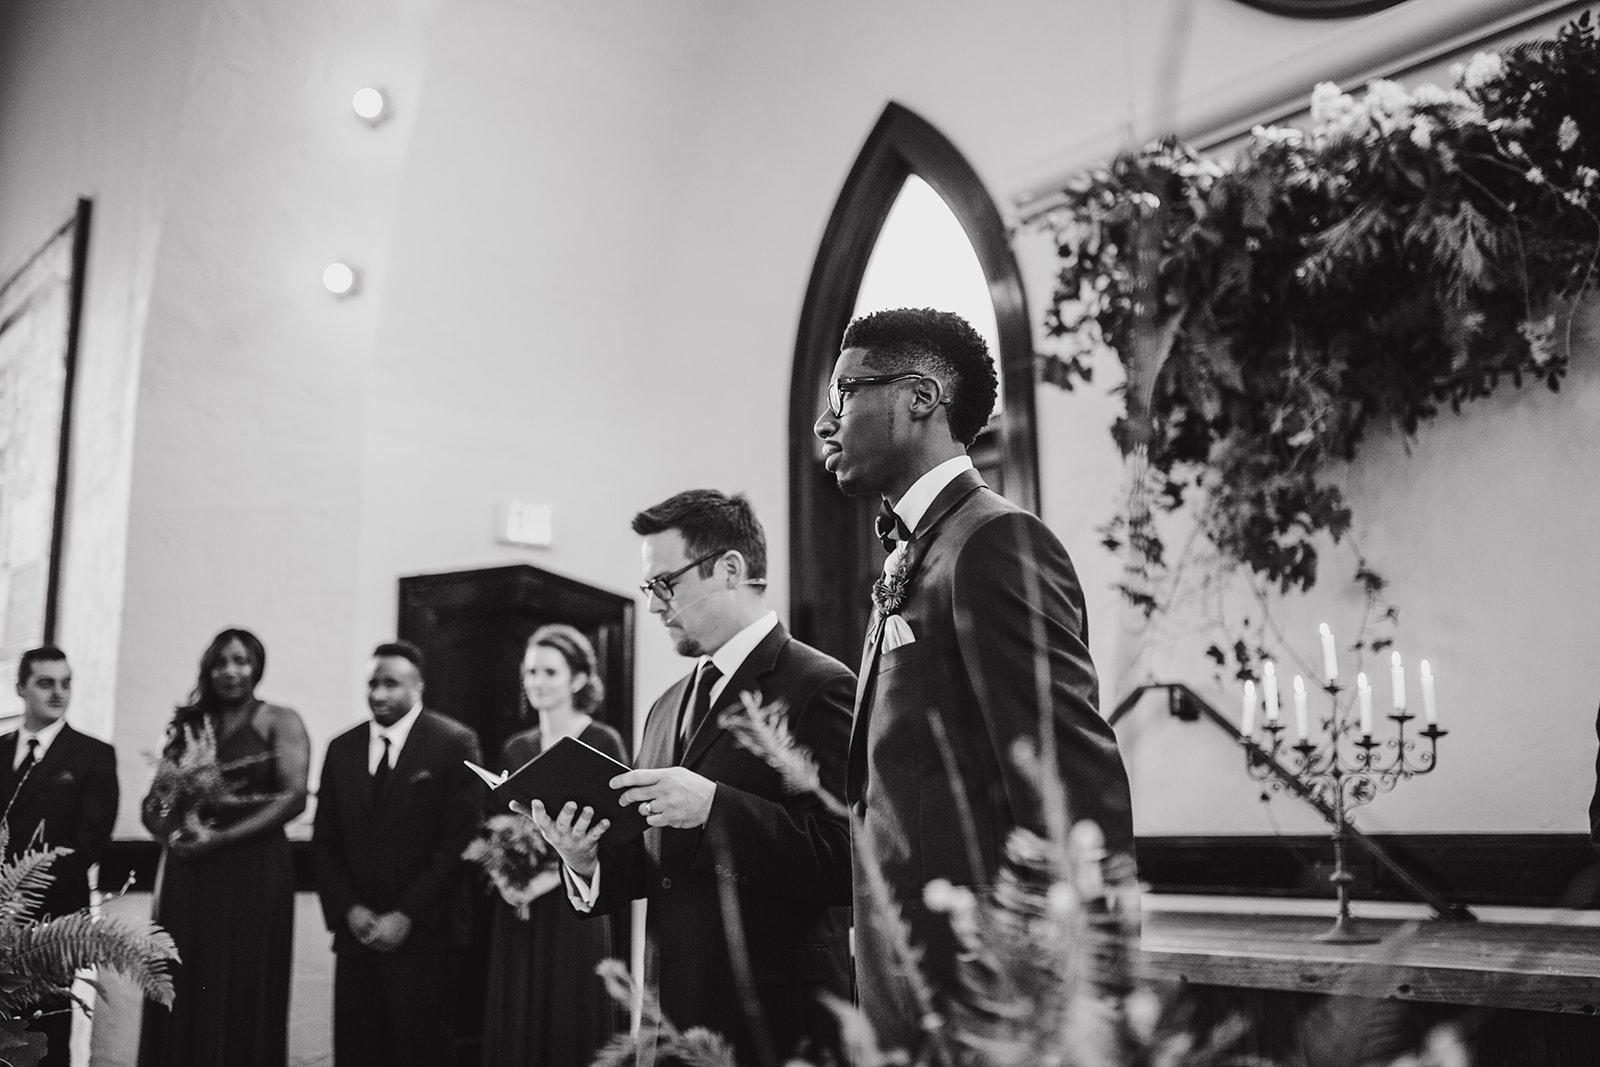 portland - wedding - photographer - doorofhopechurch431.jpg